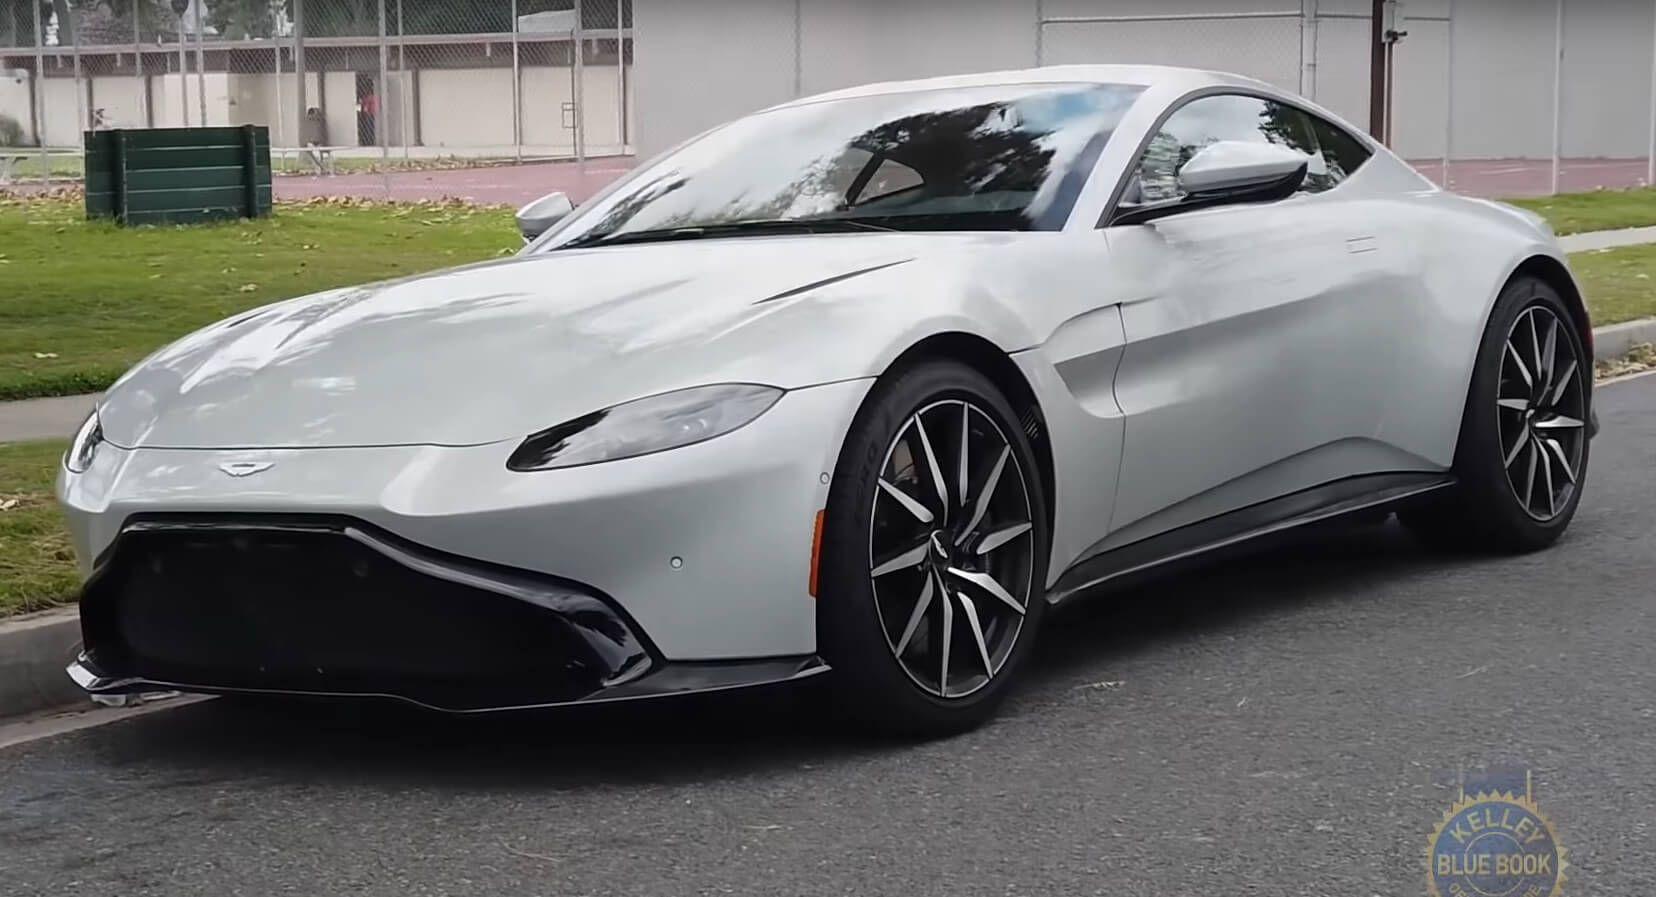 The 2020 Aston Martin Vantage Just Begs To Be Driven Hard Astonmartin Astonmartinvantage Astonmartinvideos Reviews Aston Martin Vantage Aston Martin Aston